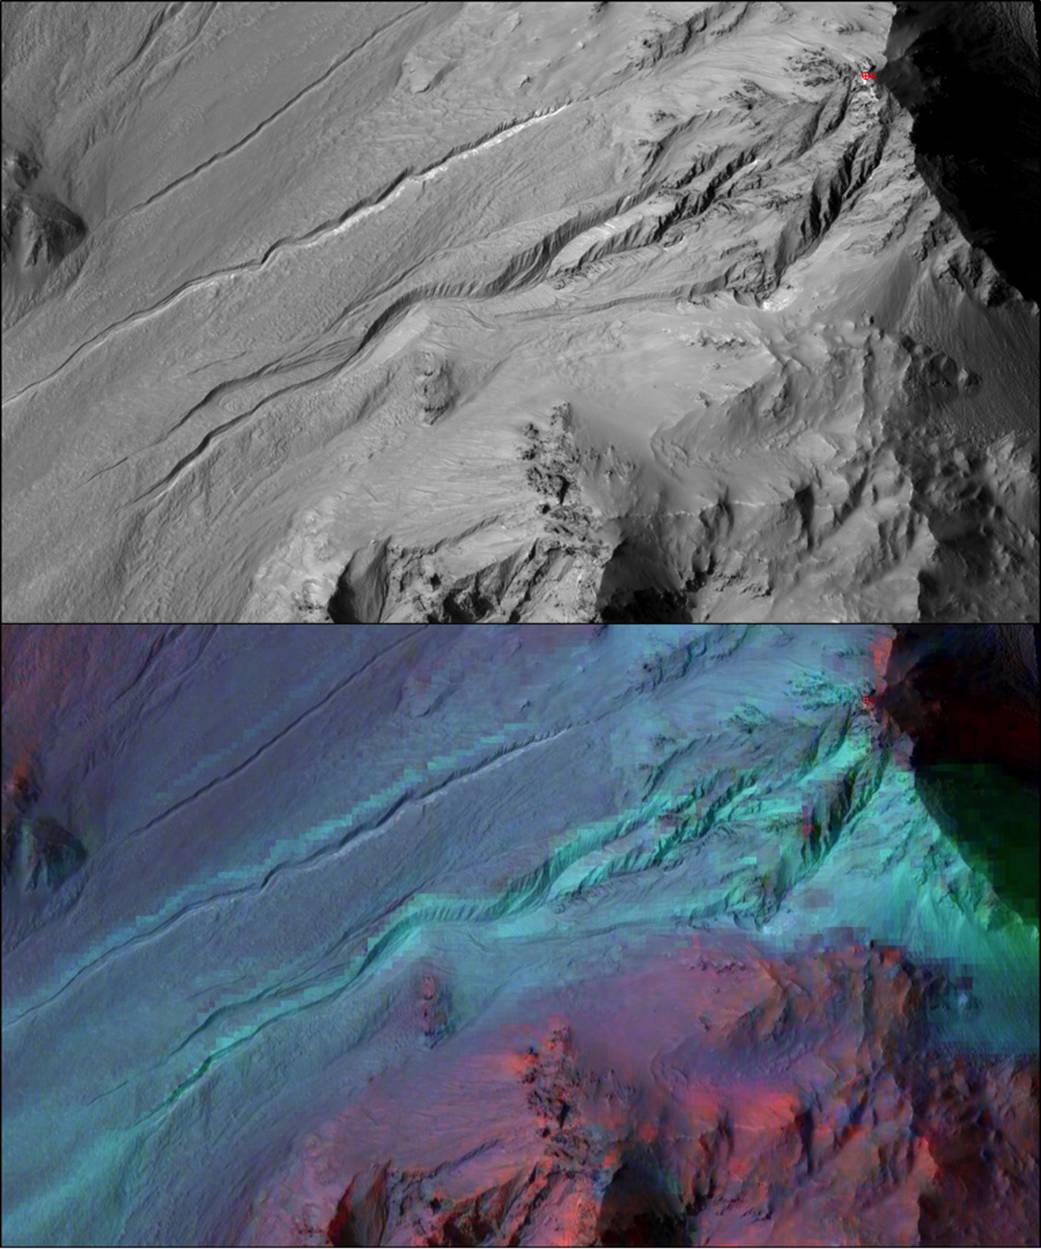 Traces of water on Mars. Credits: NASA